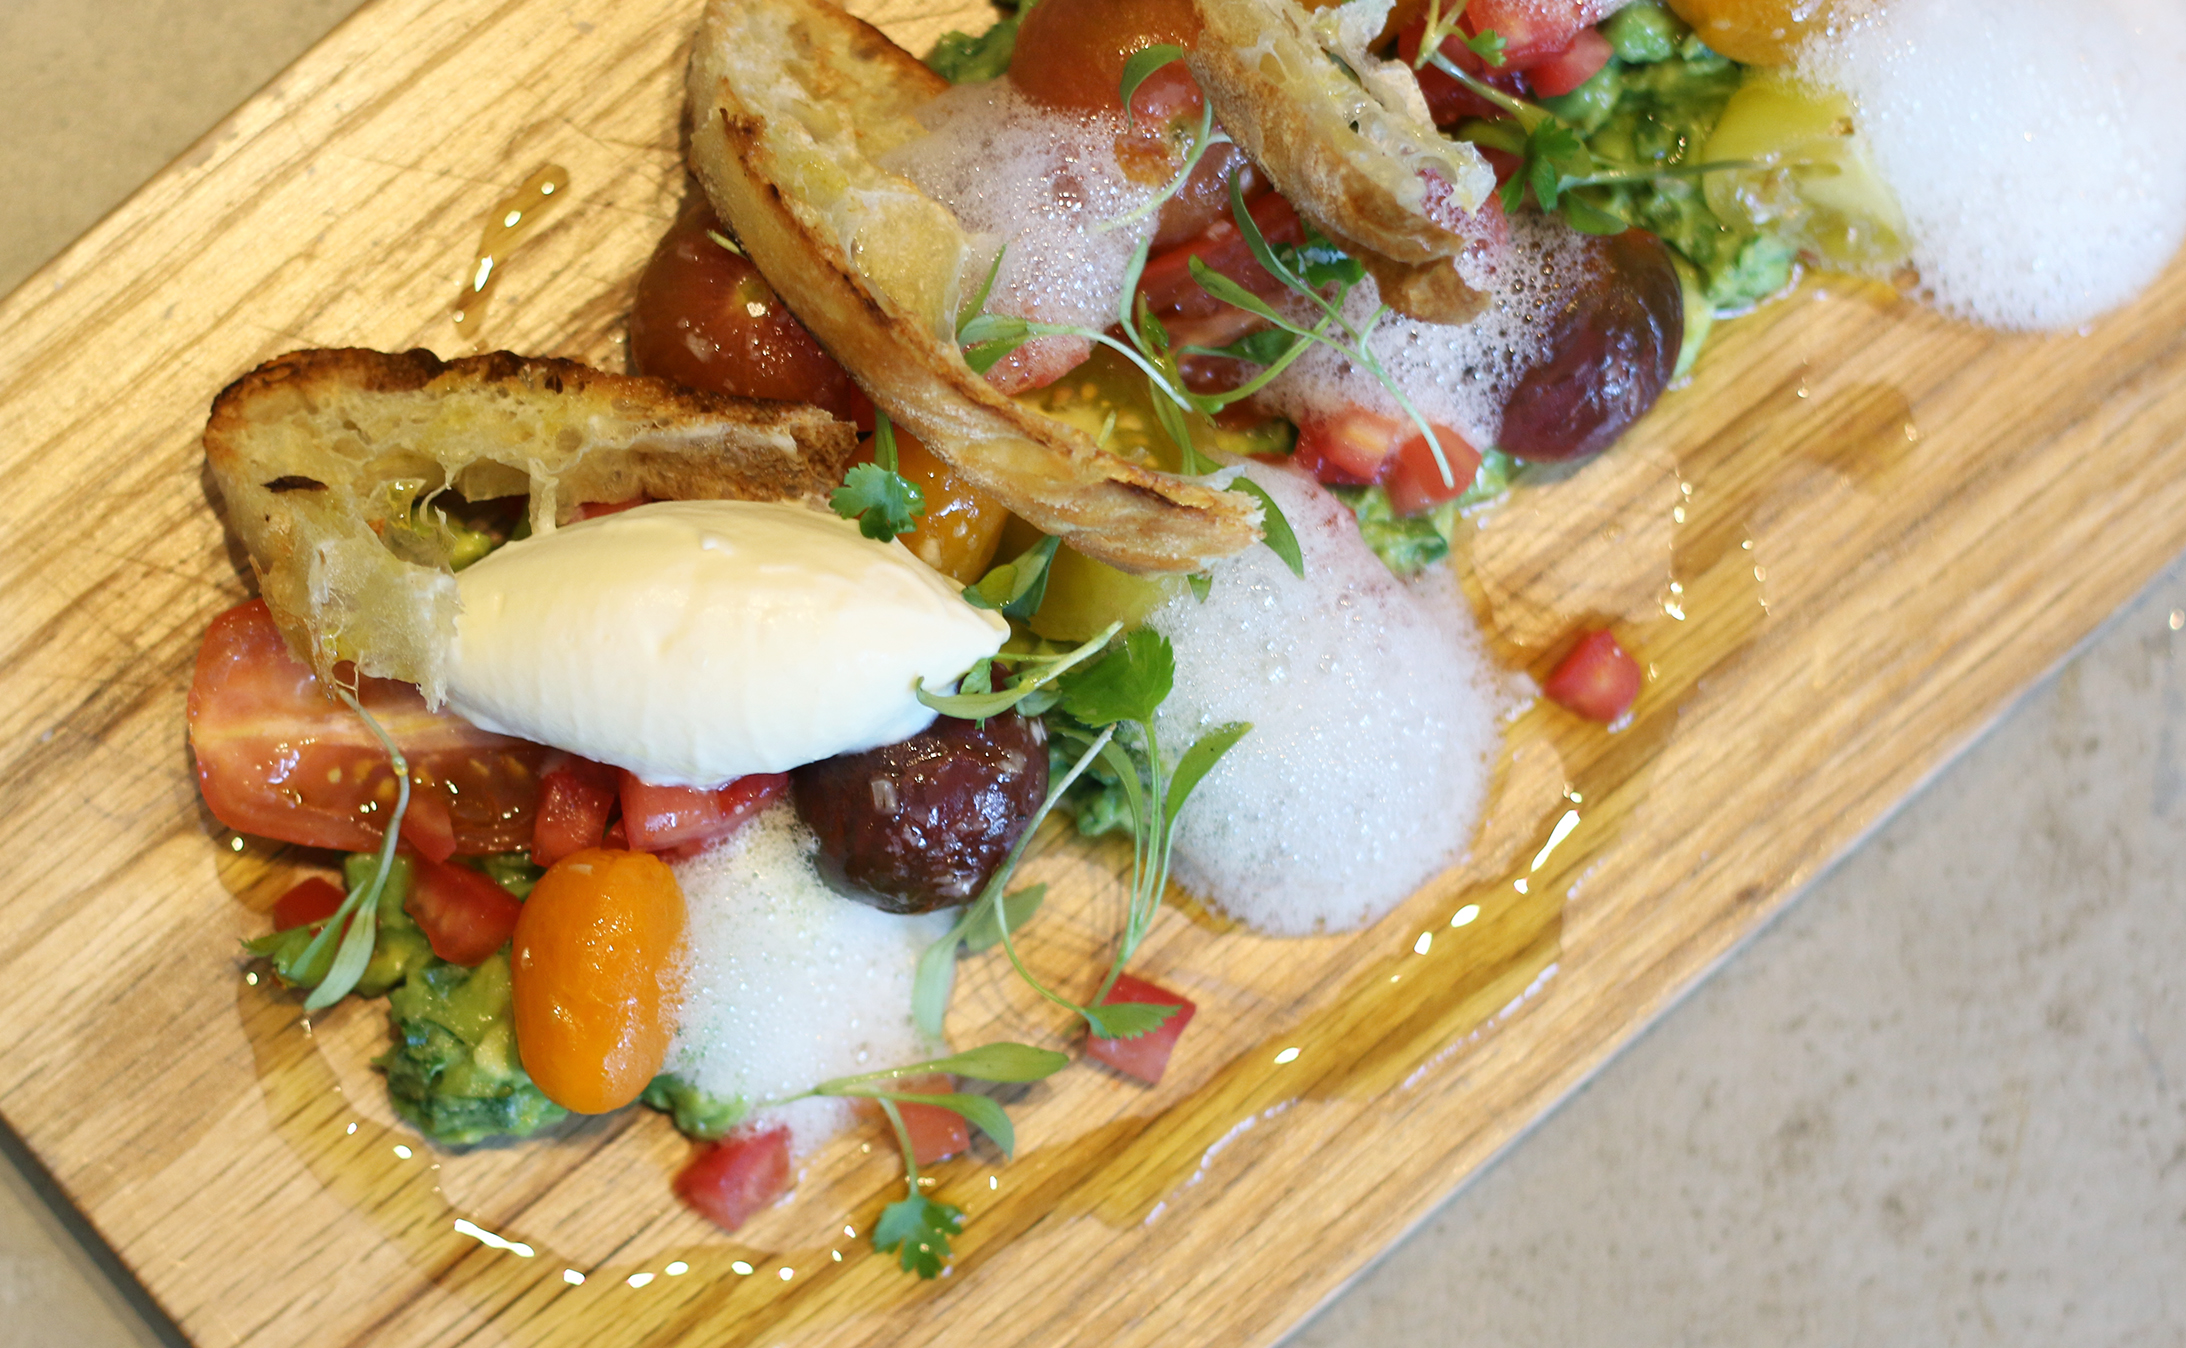 Heirloom Tomato Salad with Avocado